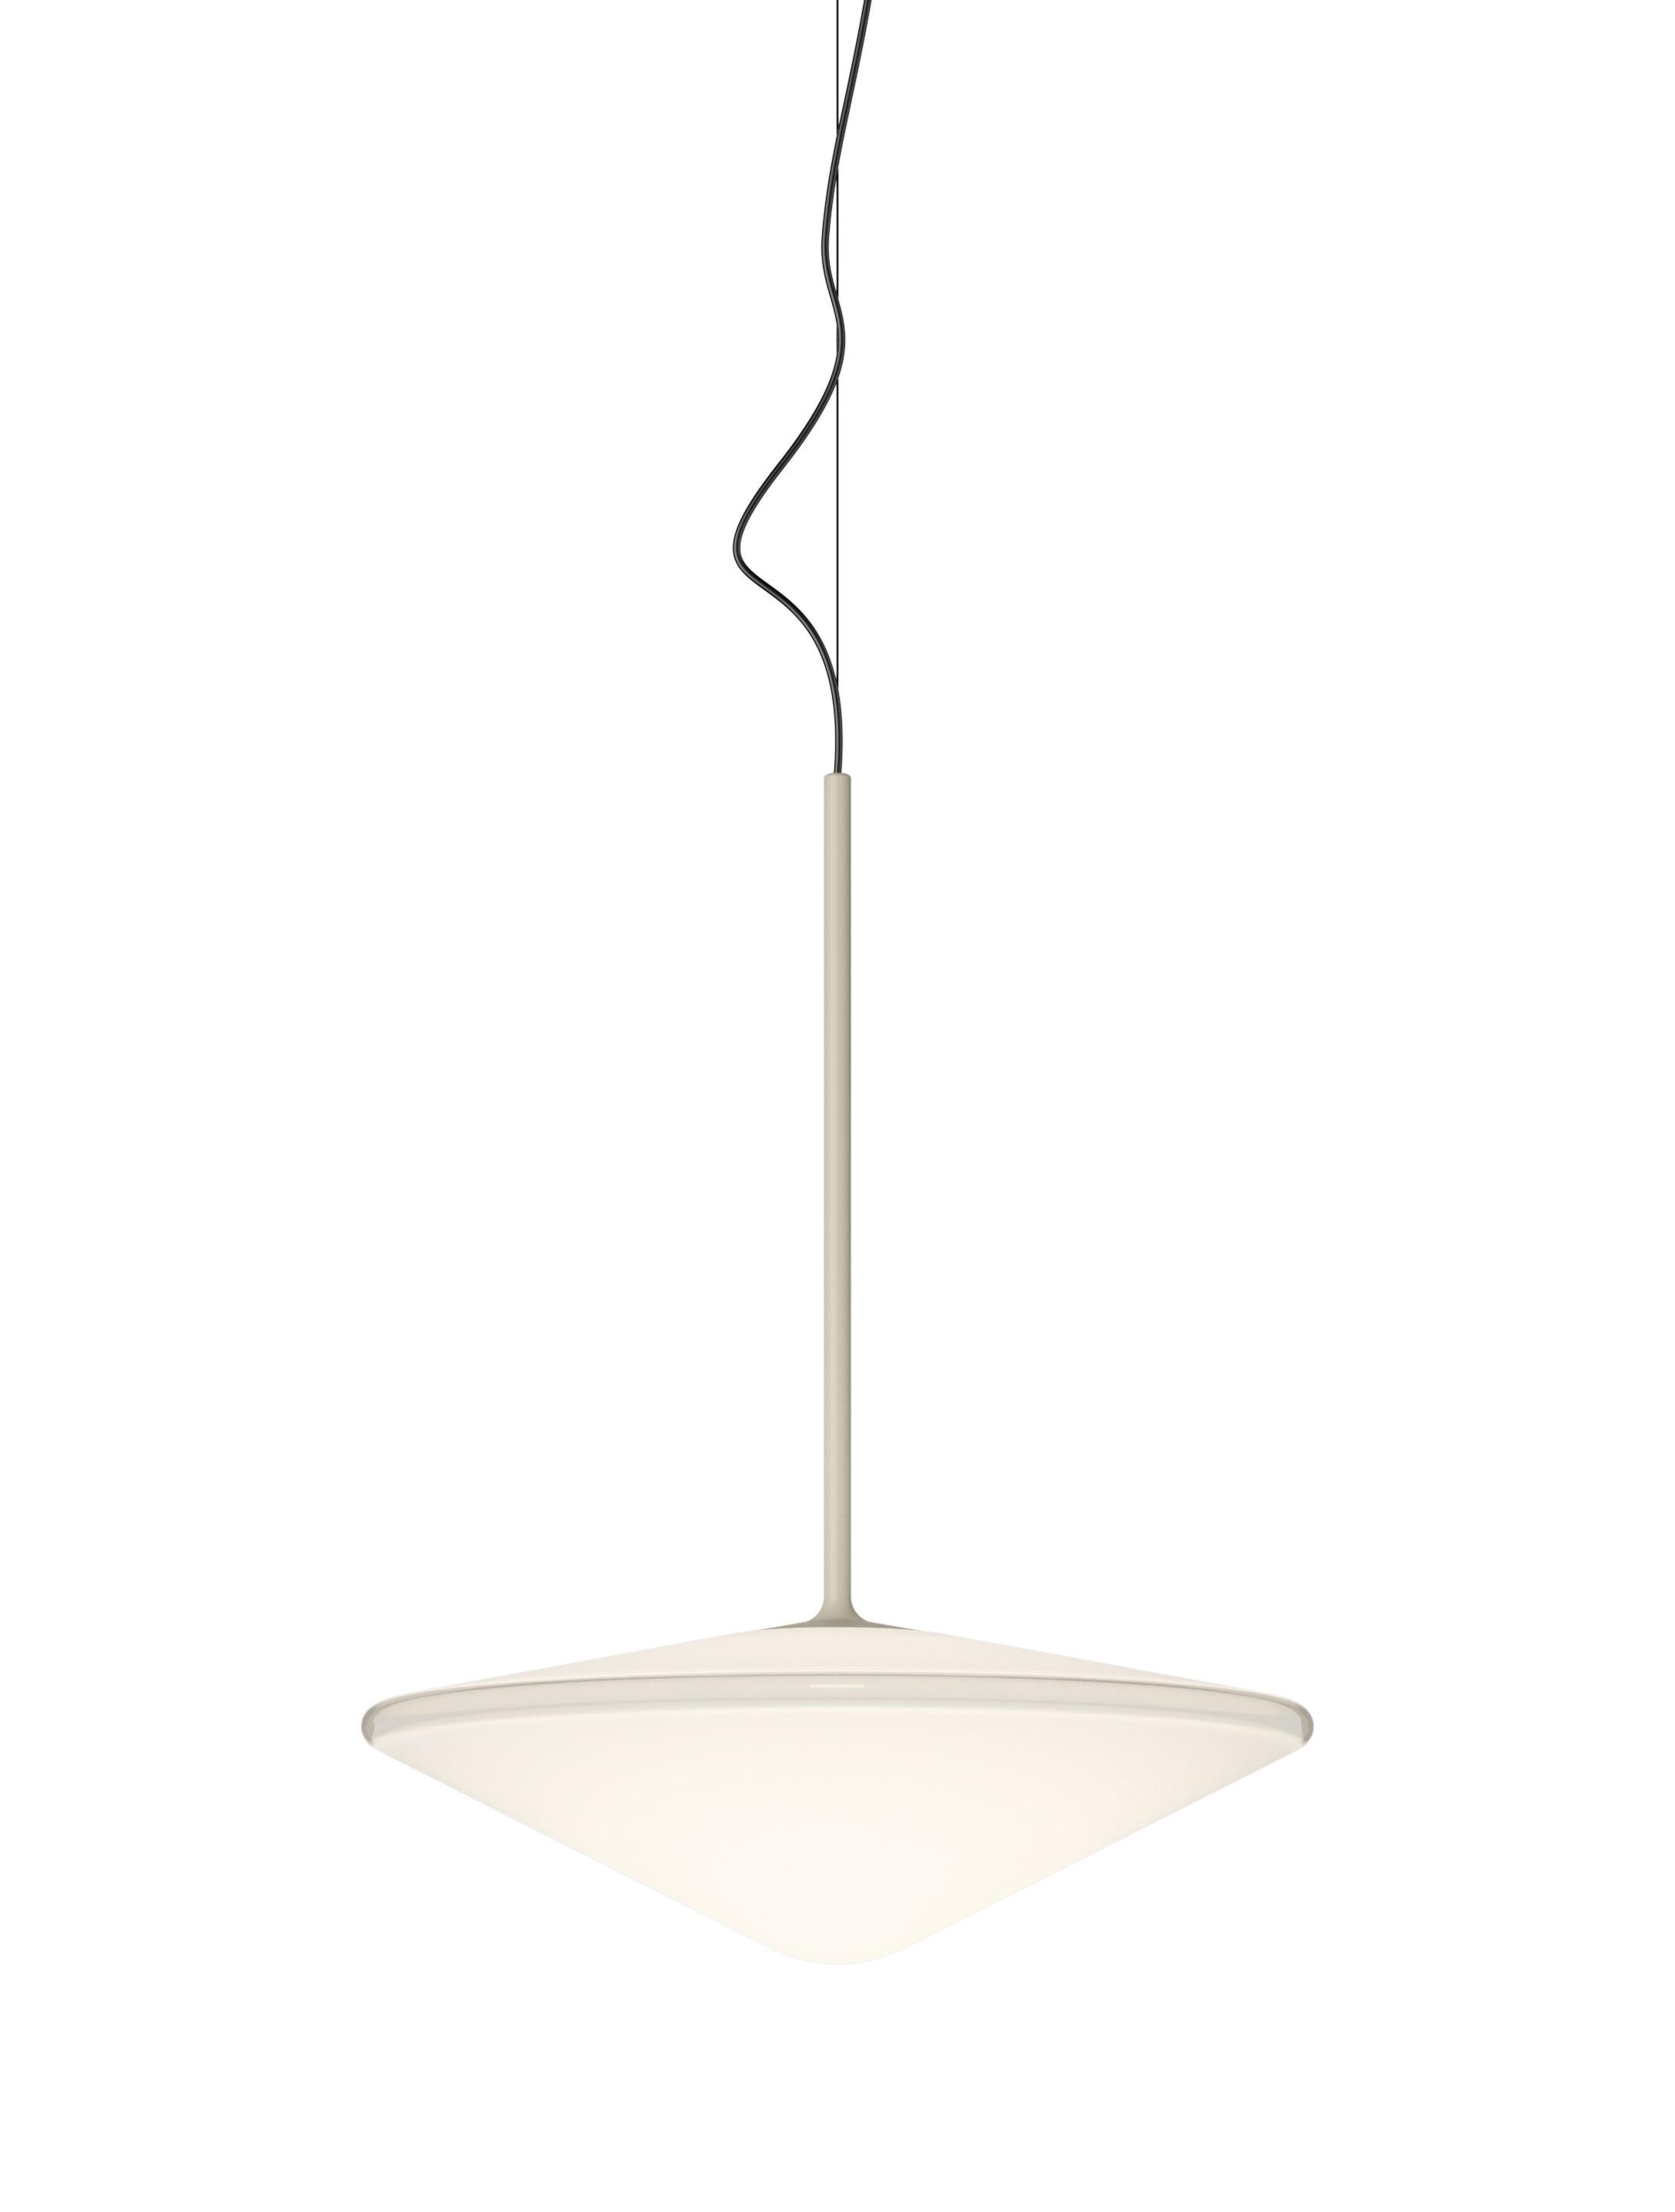 Lighting - Pendant Lighting - Tempo Triangle Pendant - / LED - Ø 35 cm by Vibia - Beige - Blown glass, Varnished aluminium